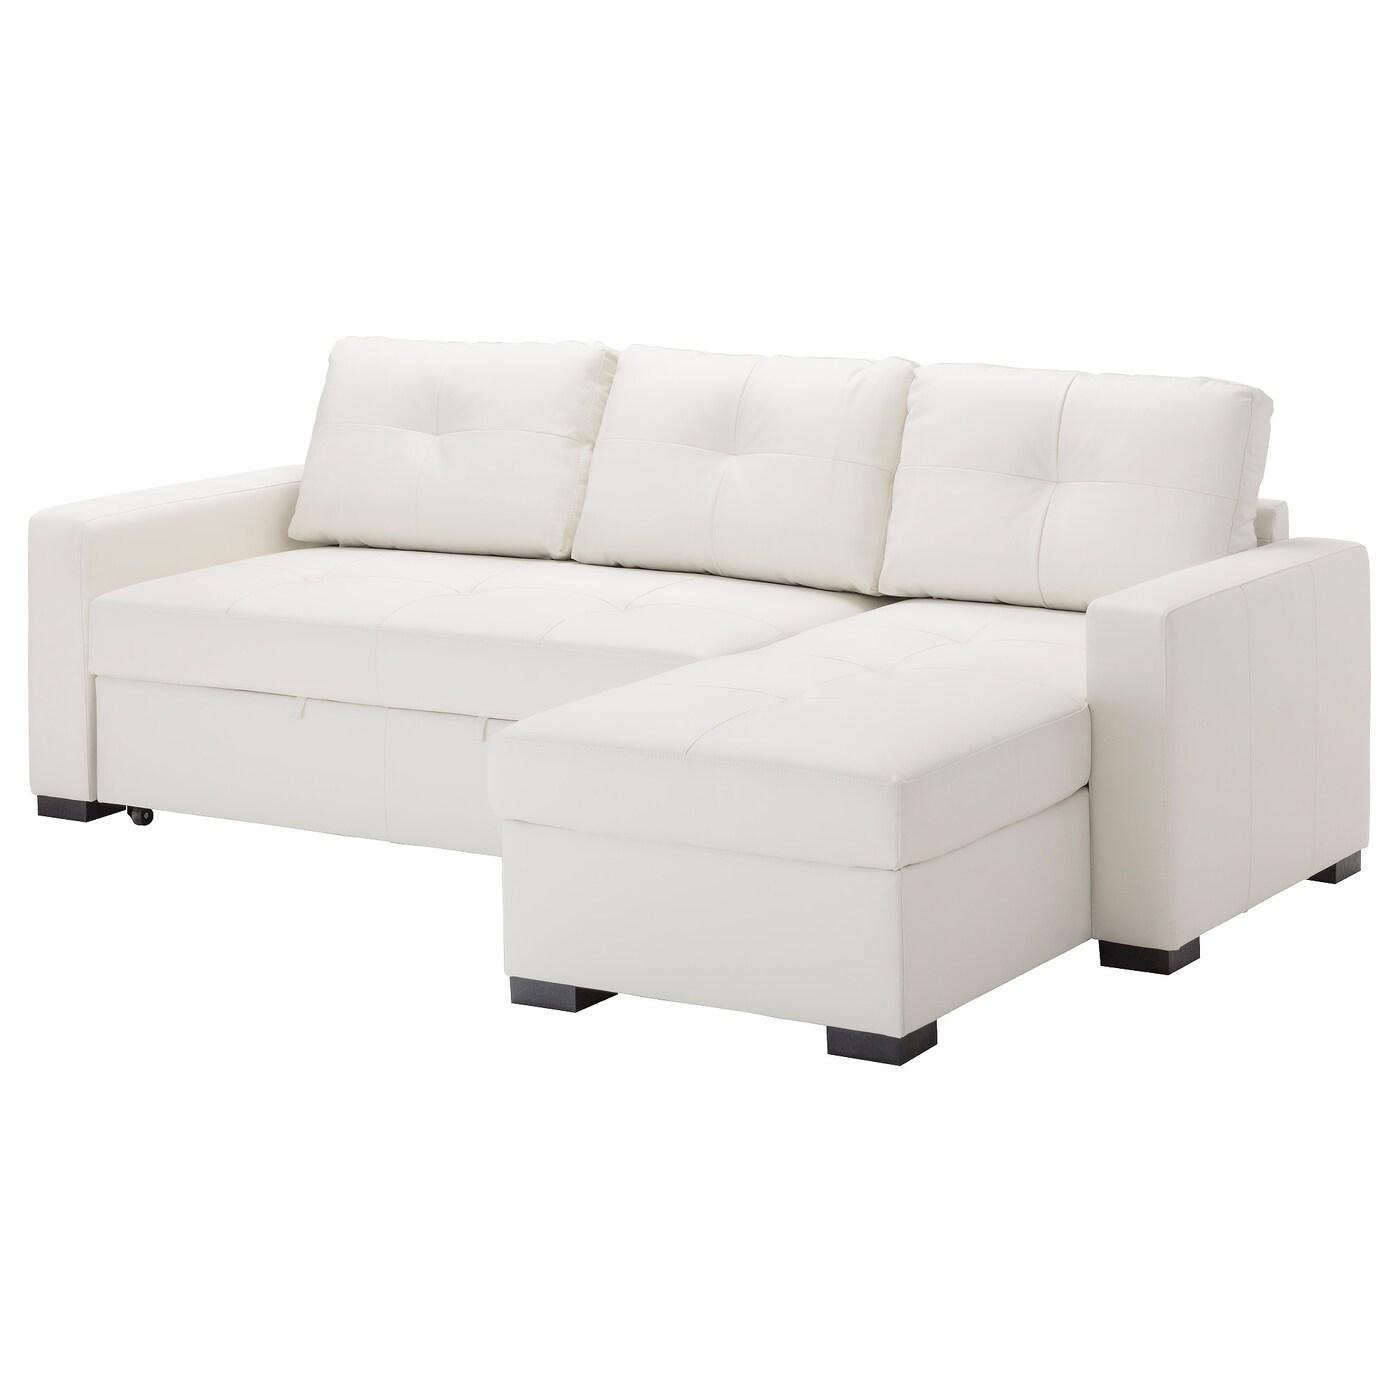 Ragunda Sofa Cama Esquina Con Almacenaje Kimstad Hueso Ikea